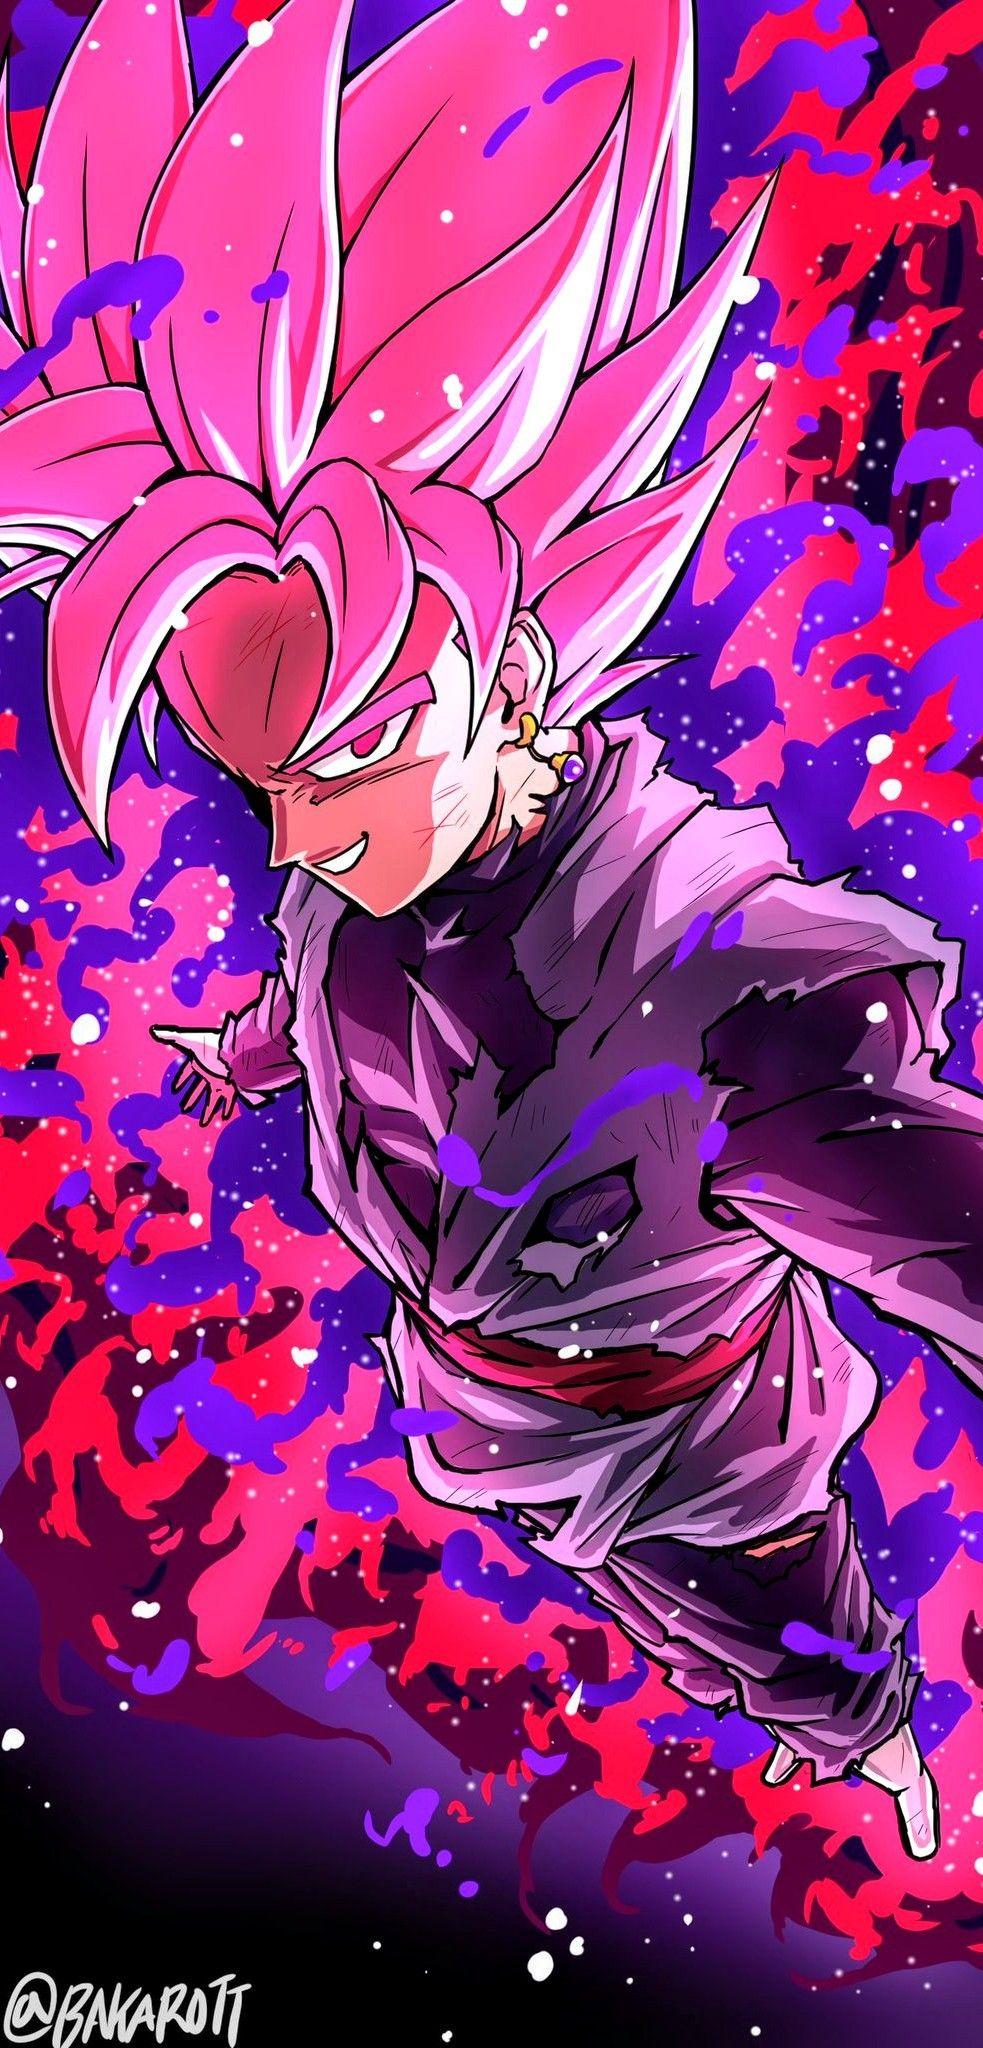 Goku Black By Bakarott Dragon Ball Super Artwork Anime Dragon Ball Super Dragon Ball Wallpapers